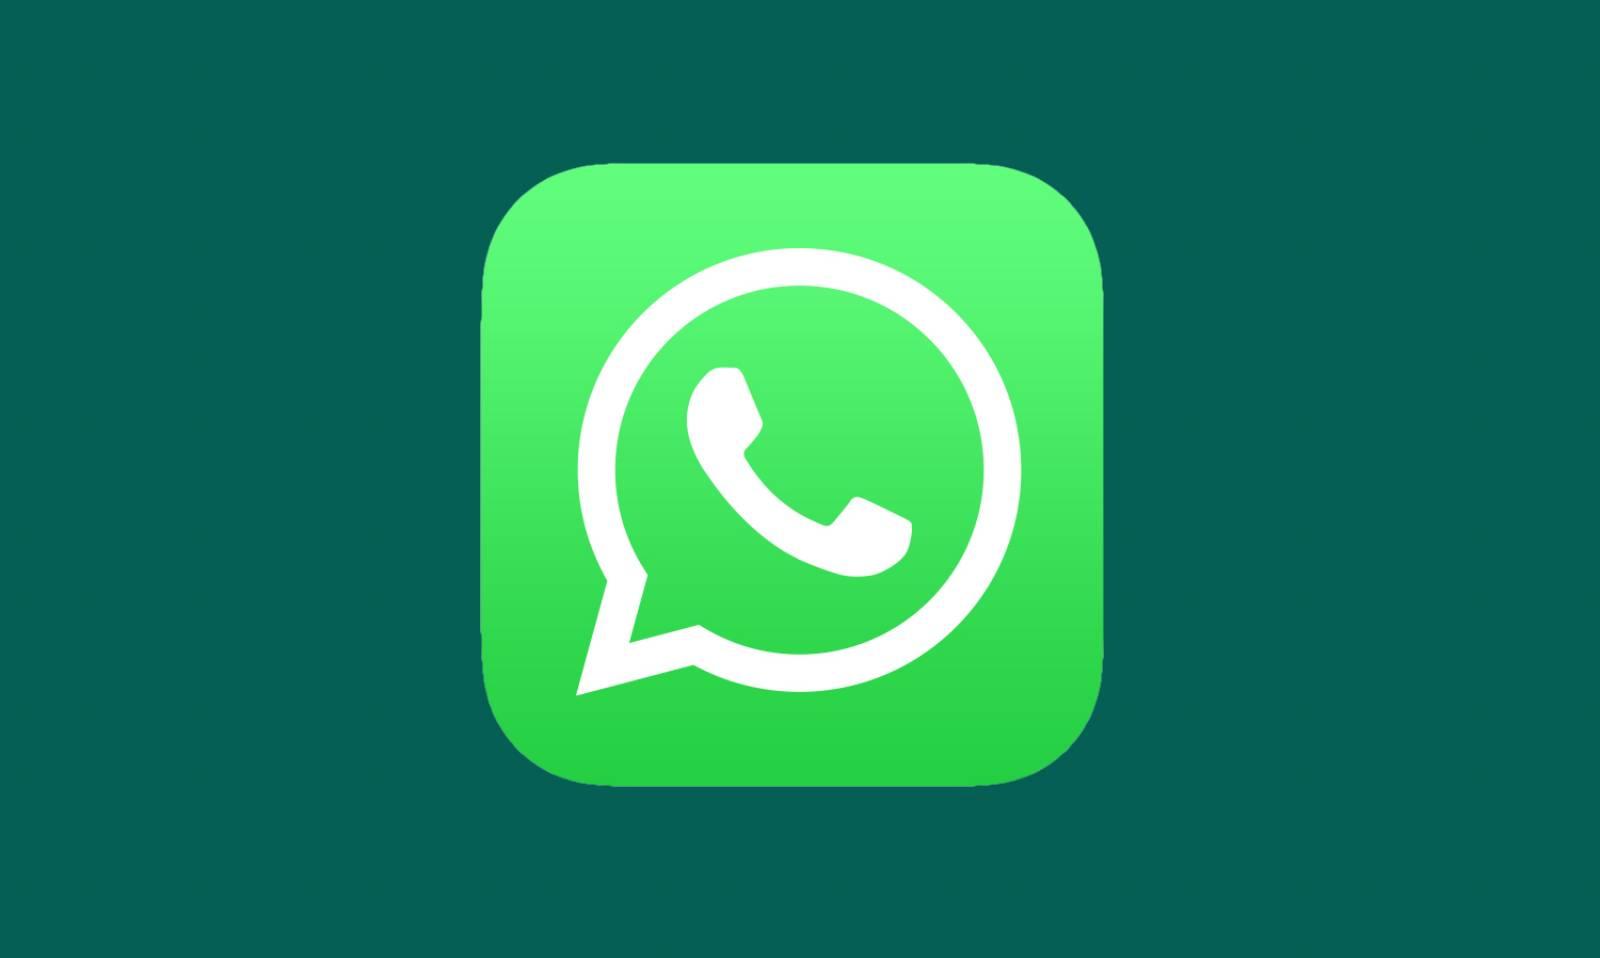 WhatsApp citirile